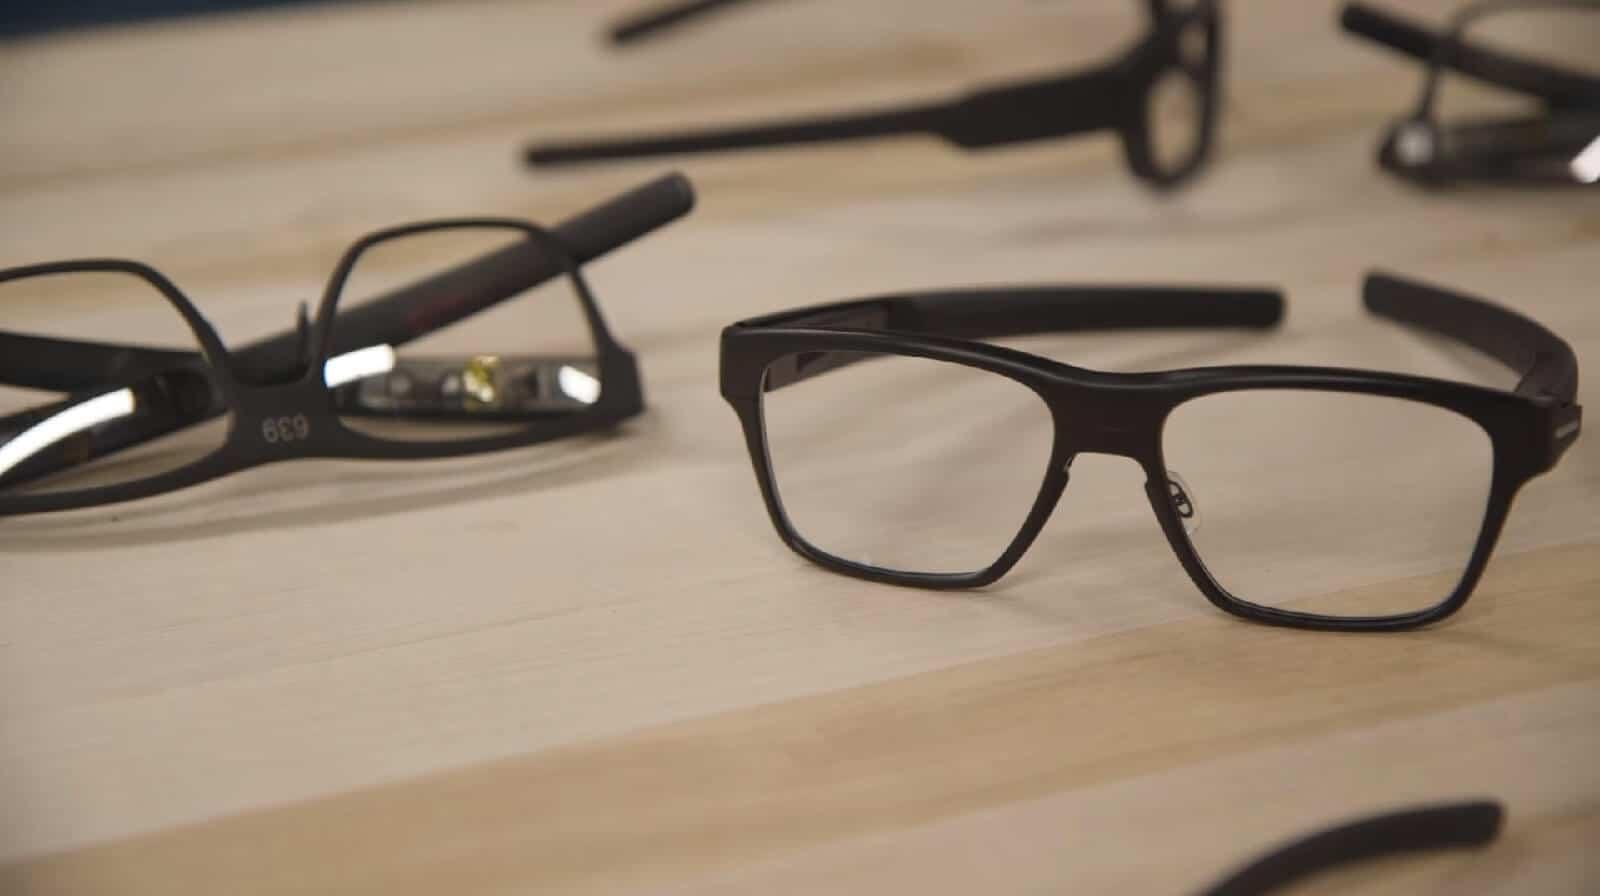 Vaunt smart glasses Intel